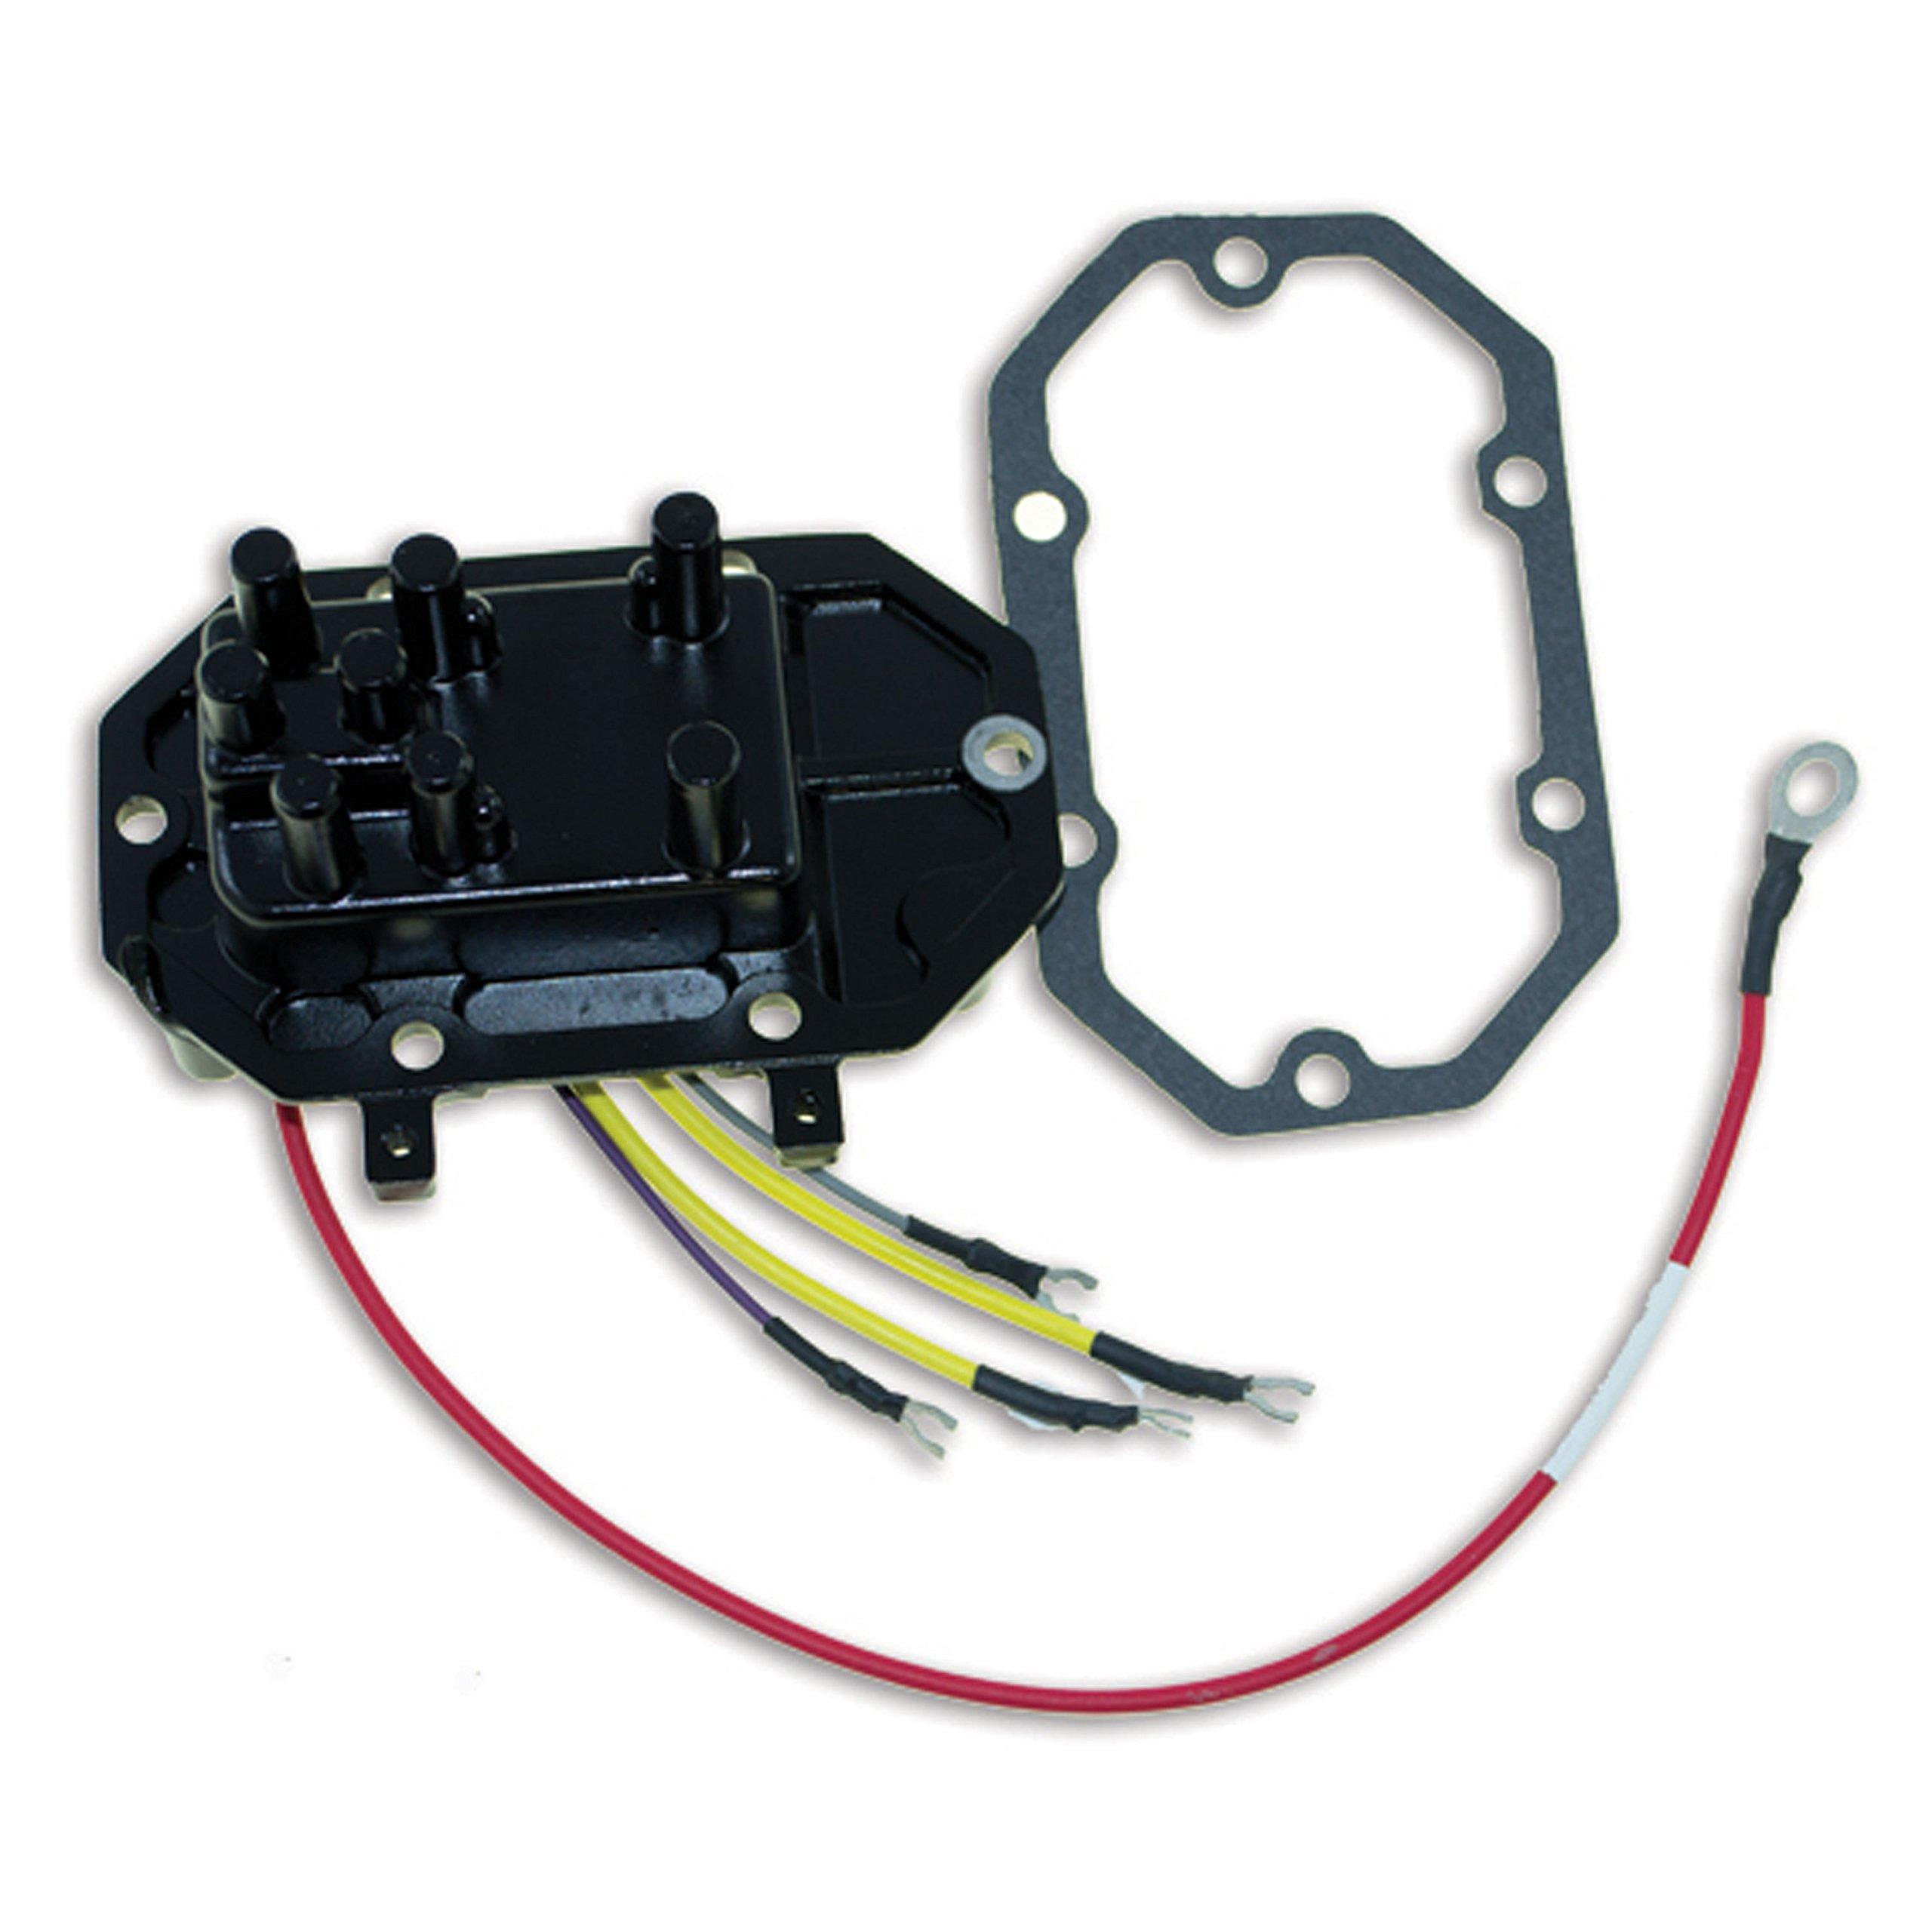 CDI Electronics 193-3689 Johnson/Evinrude Voltage Regulator - 6/8 Cyl. 35 Amp (1985-1992)